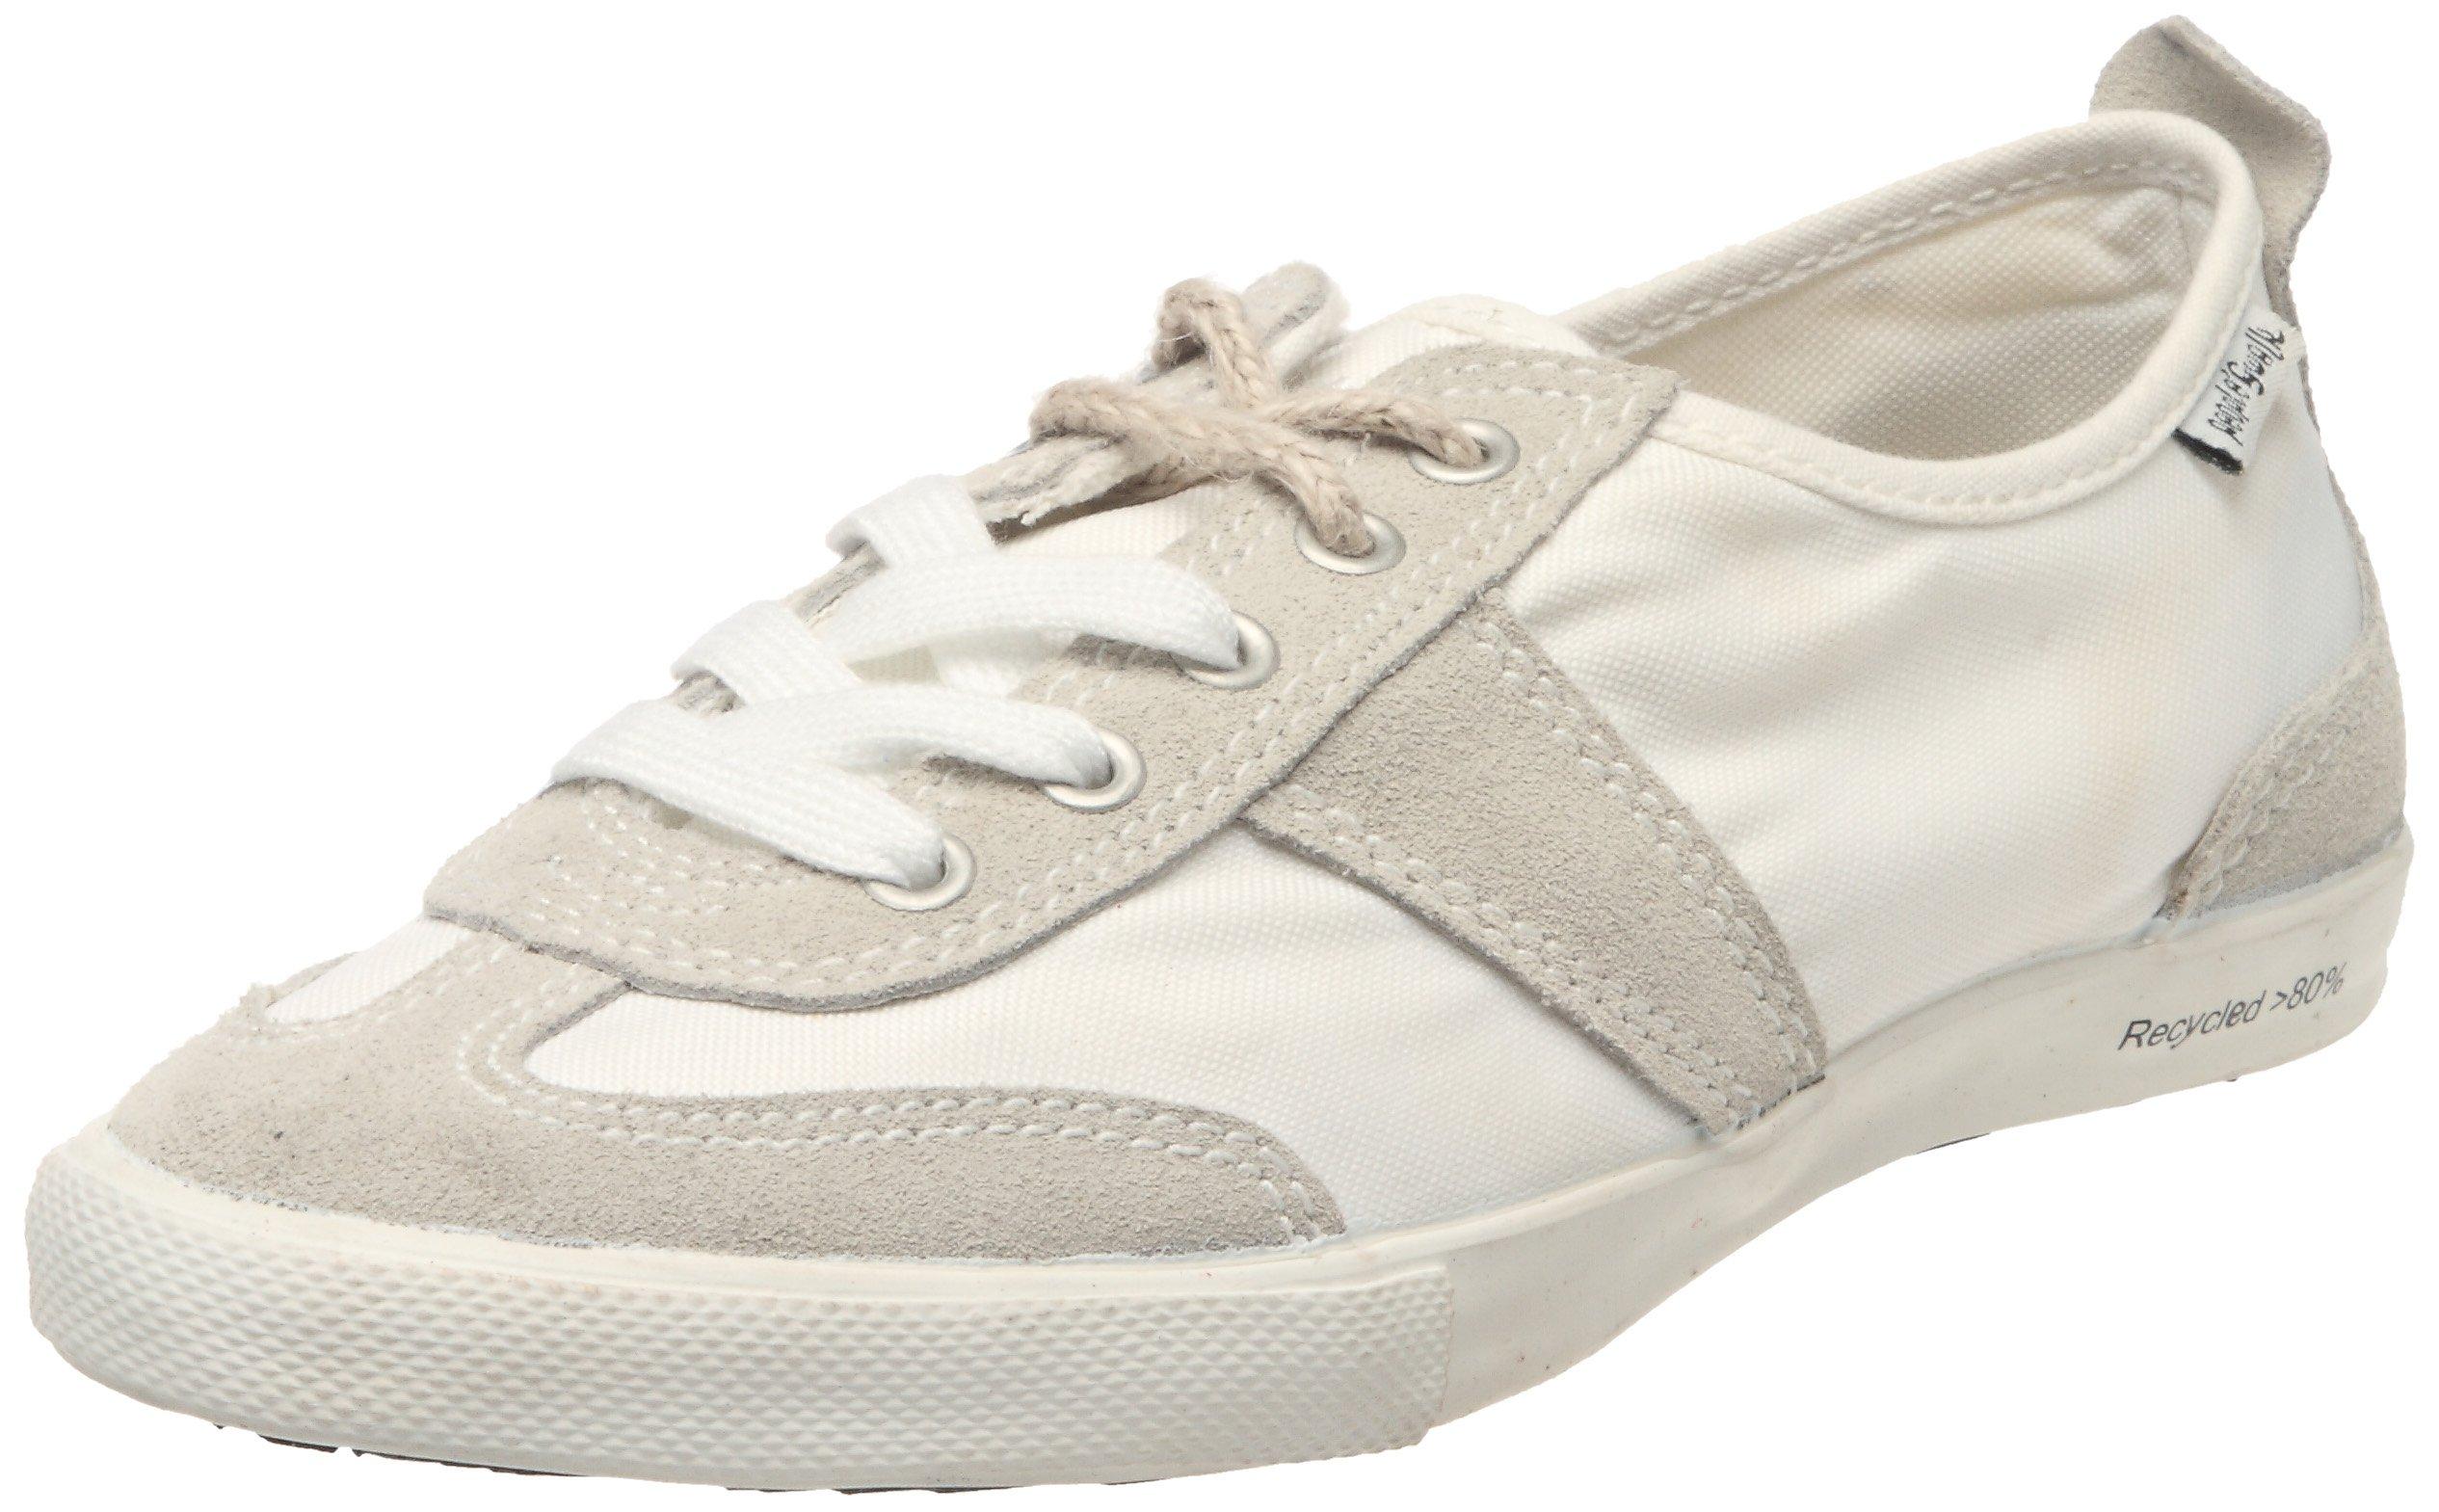 Grant, Baskets mode femme - Gris, 36 EUPeoples Walk